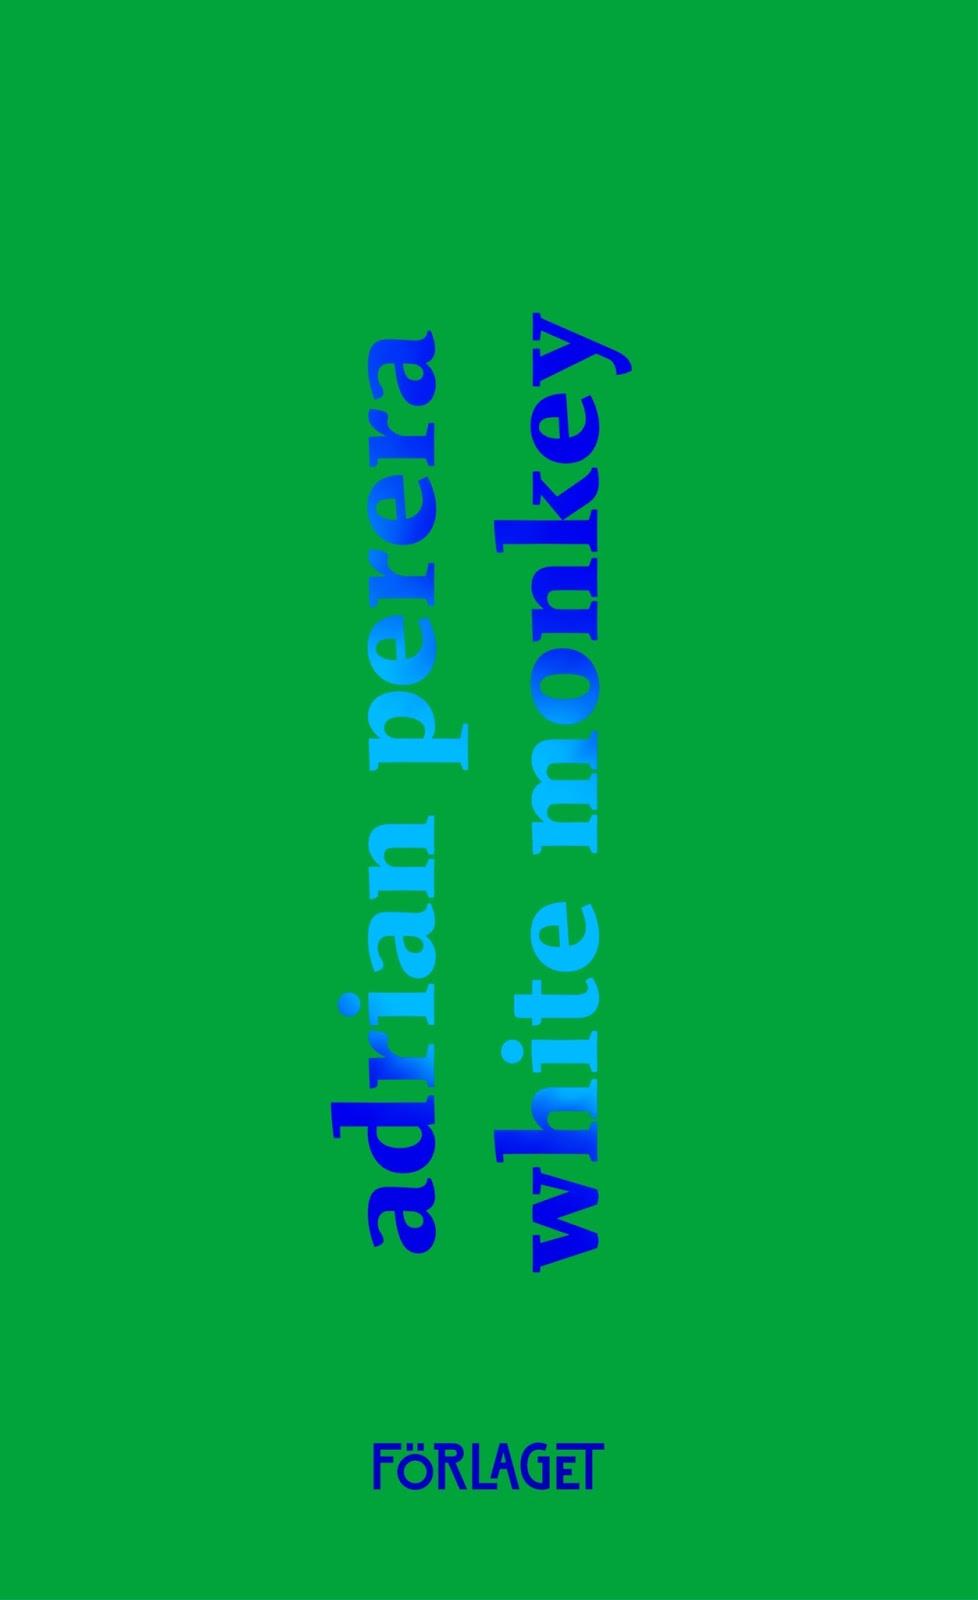 Green ber om ursakt ett genuint misstag